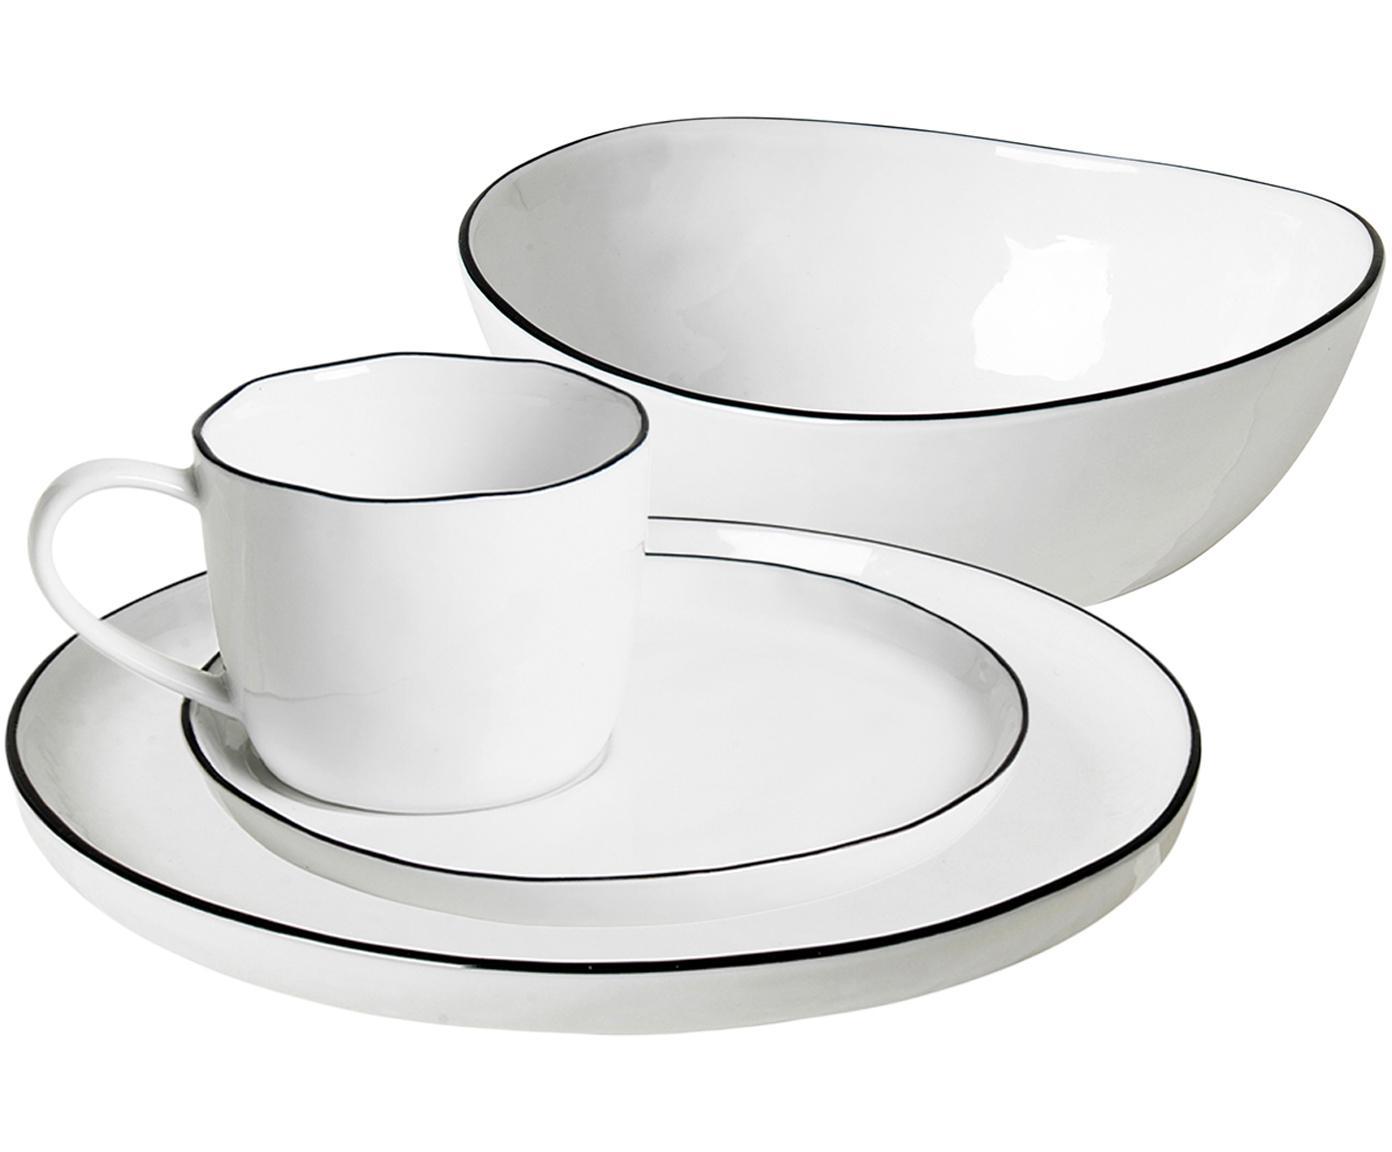 Set de desayuno artesanal Salt, 4comensales (16pzas.), Porcelana, Blanco crudo, negro, Tamaños diferentes